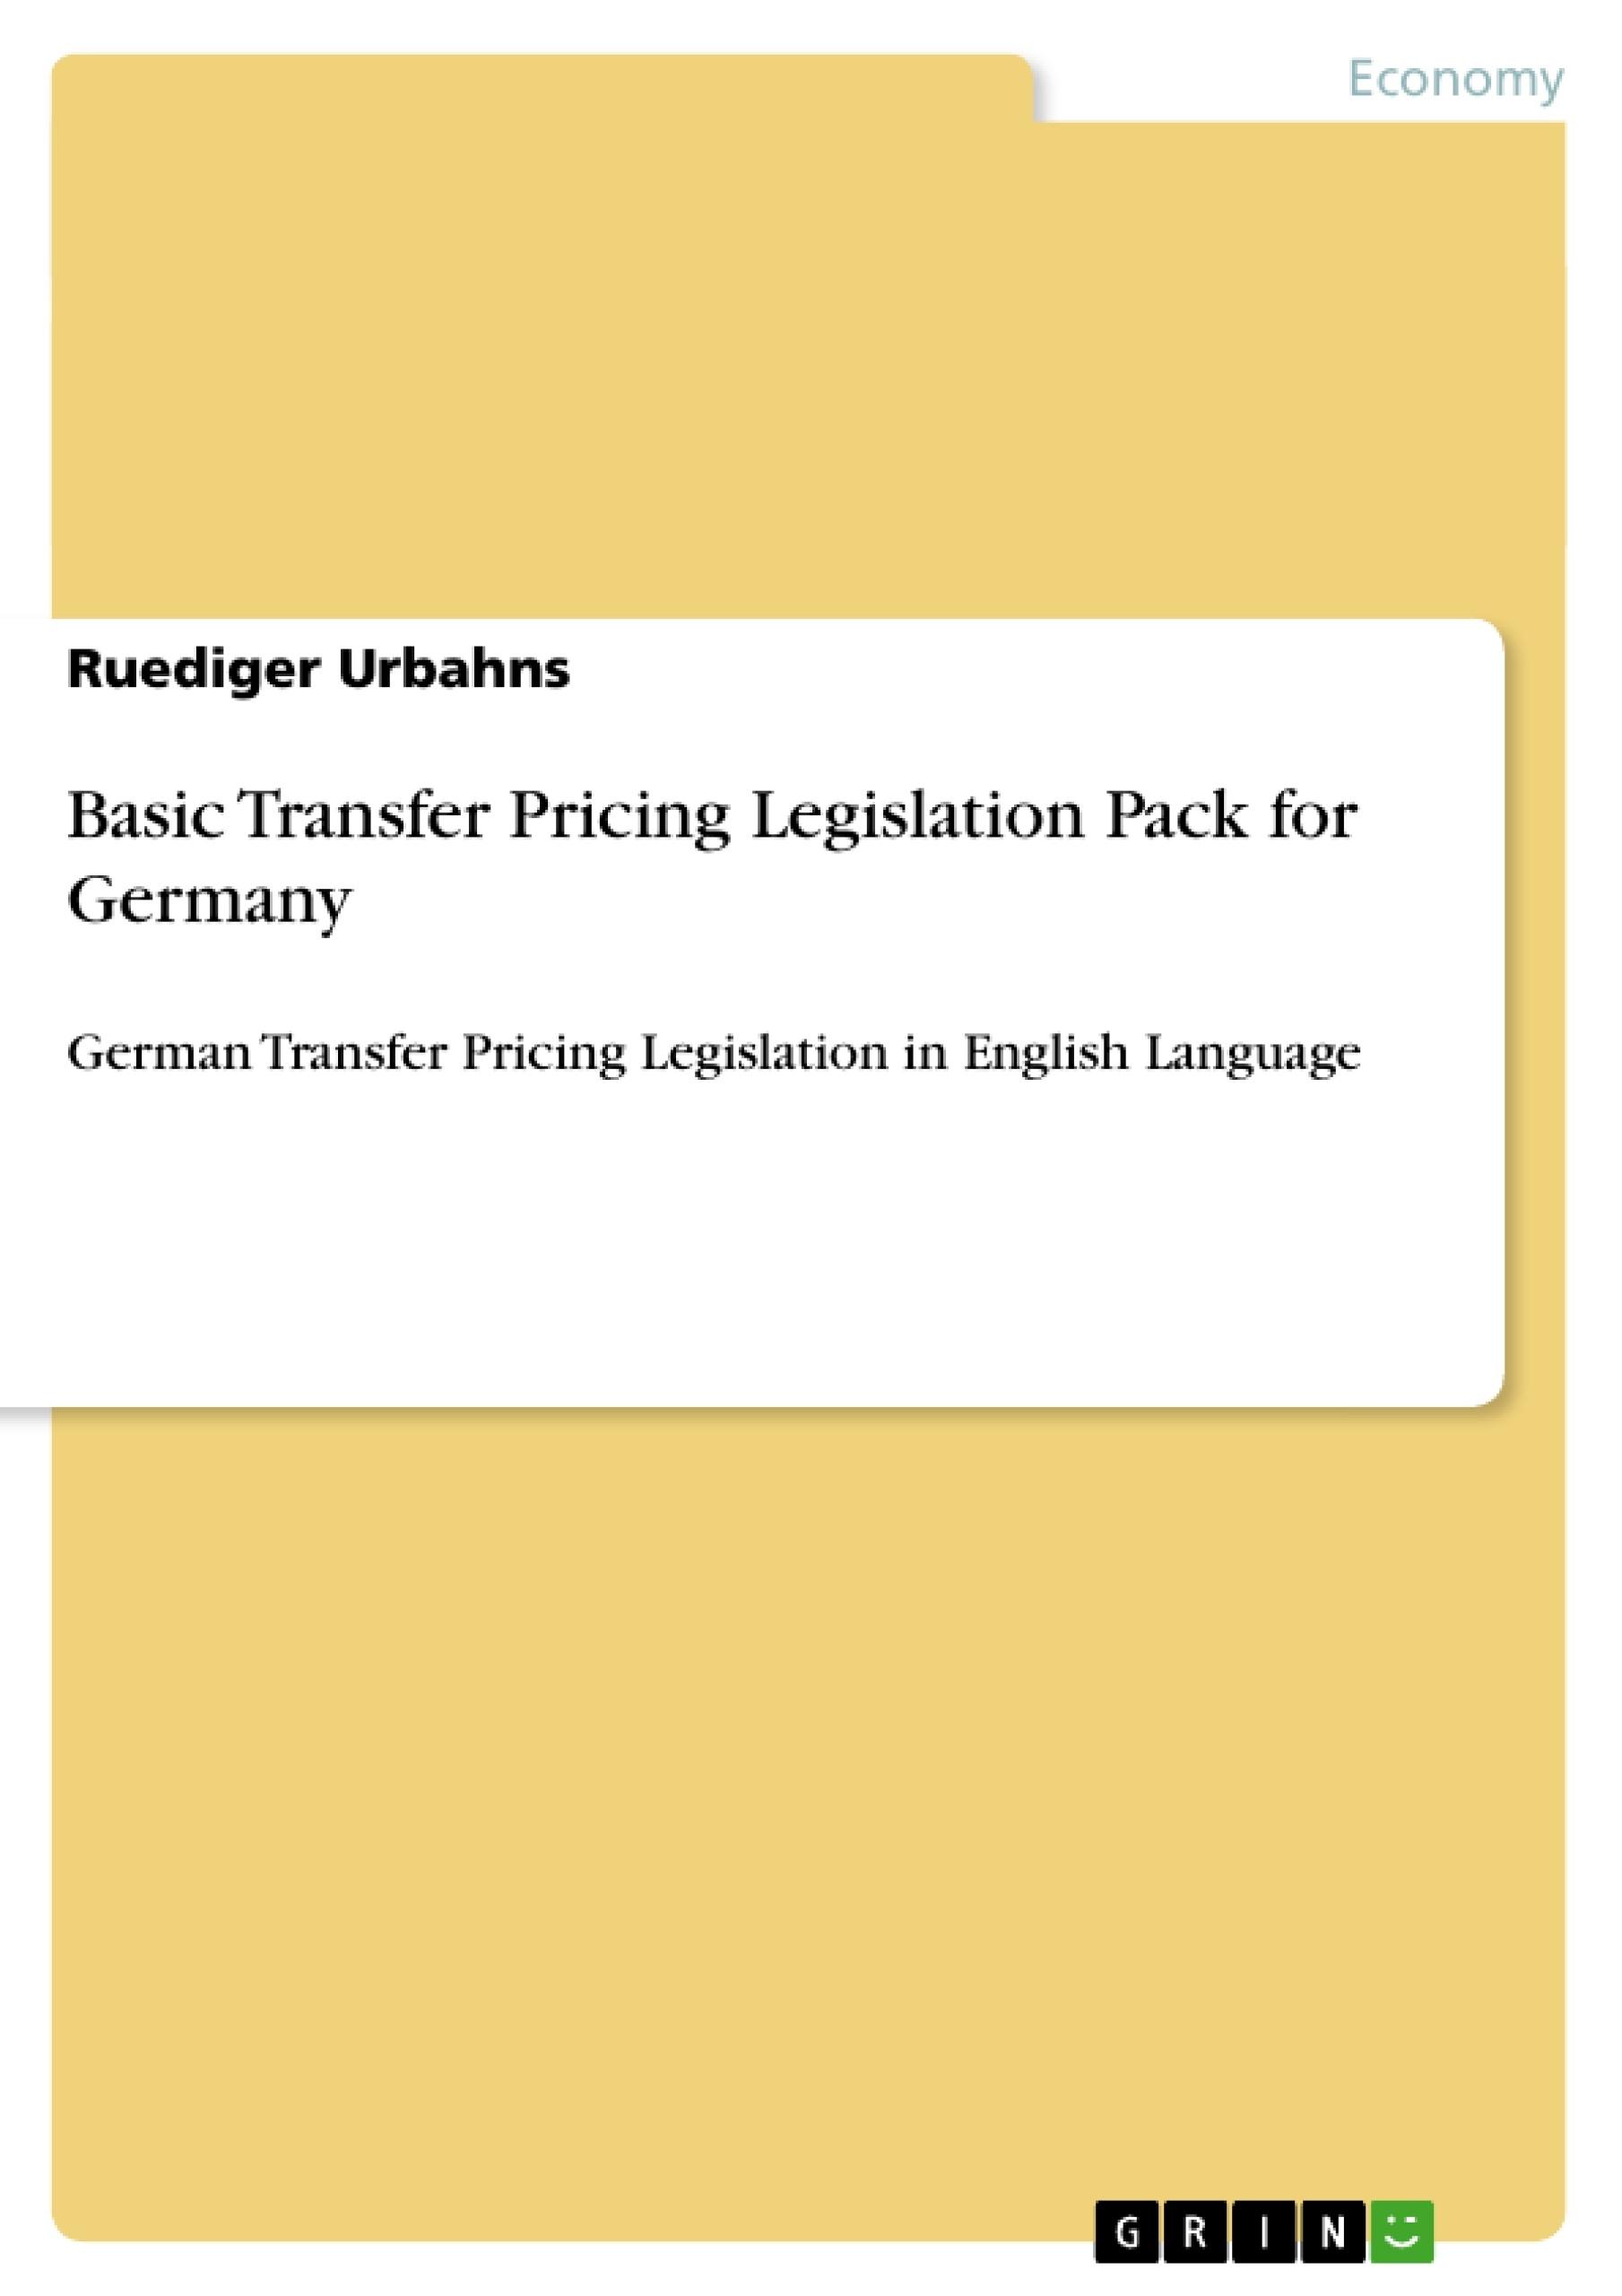 Title: Basic Transfer Pricing Legislation Pack for Germany